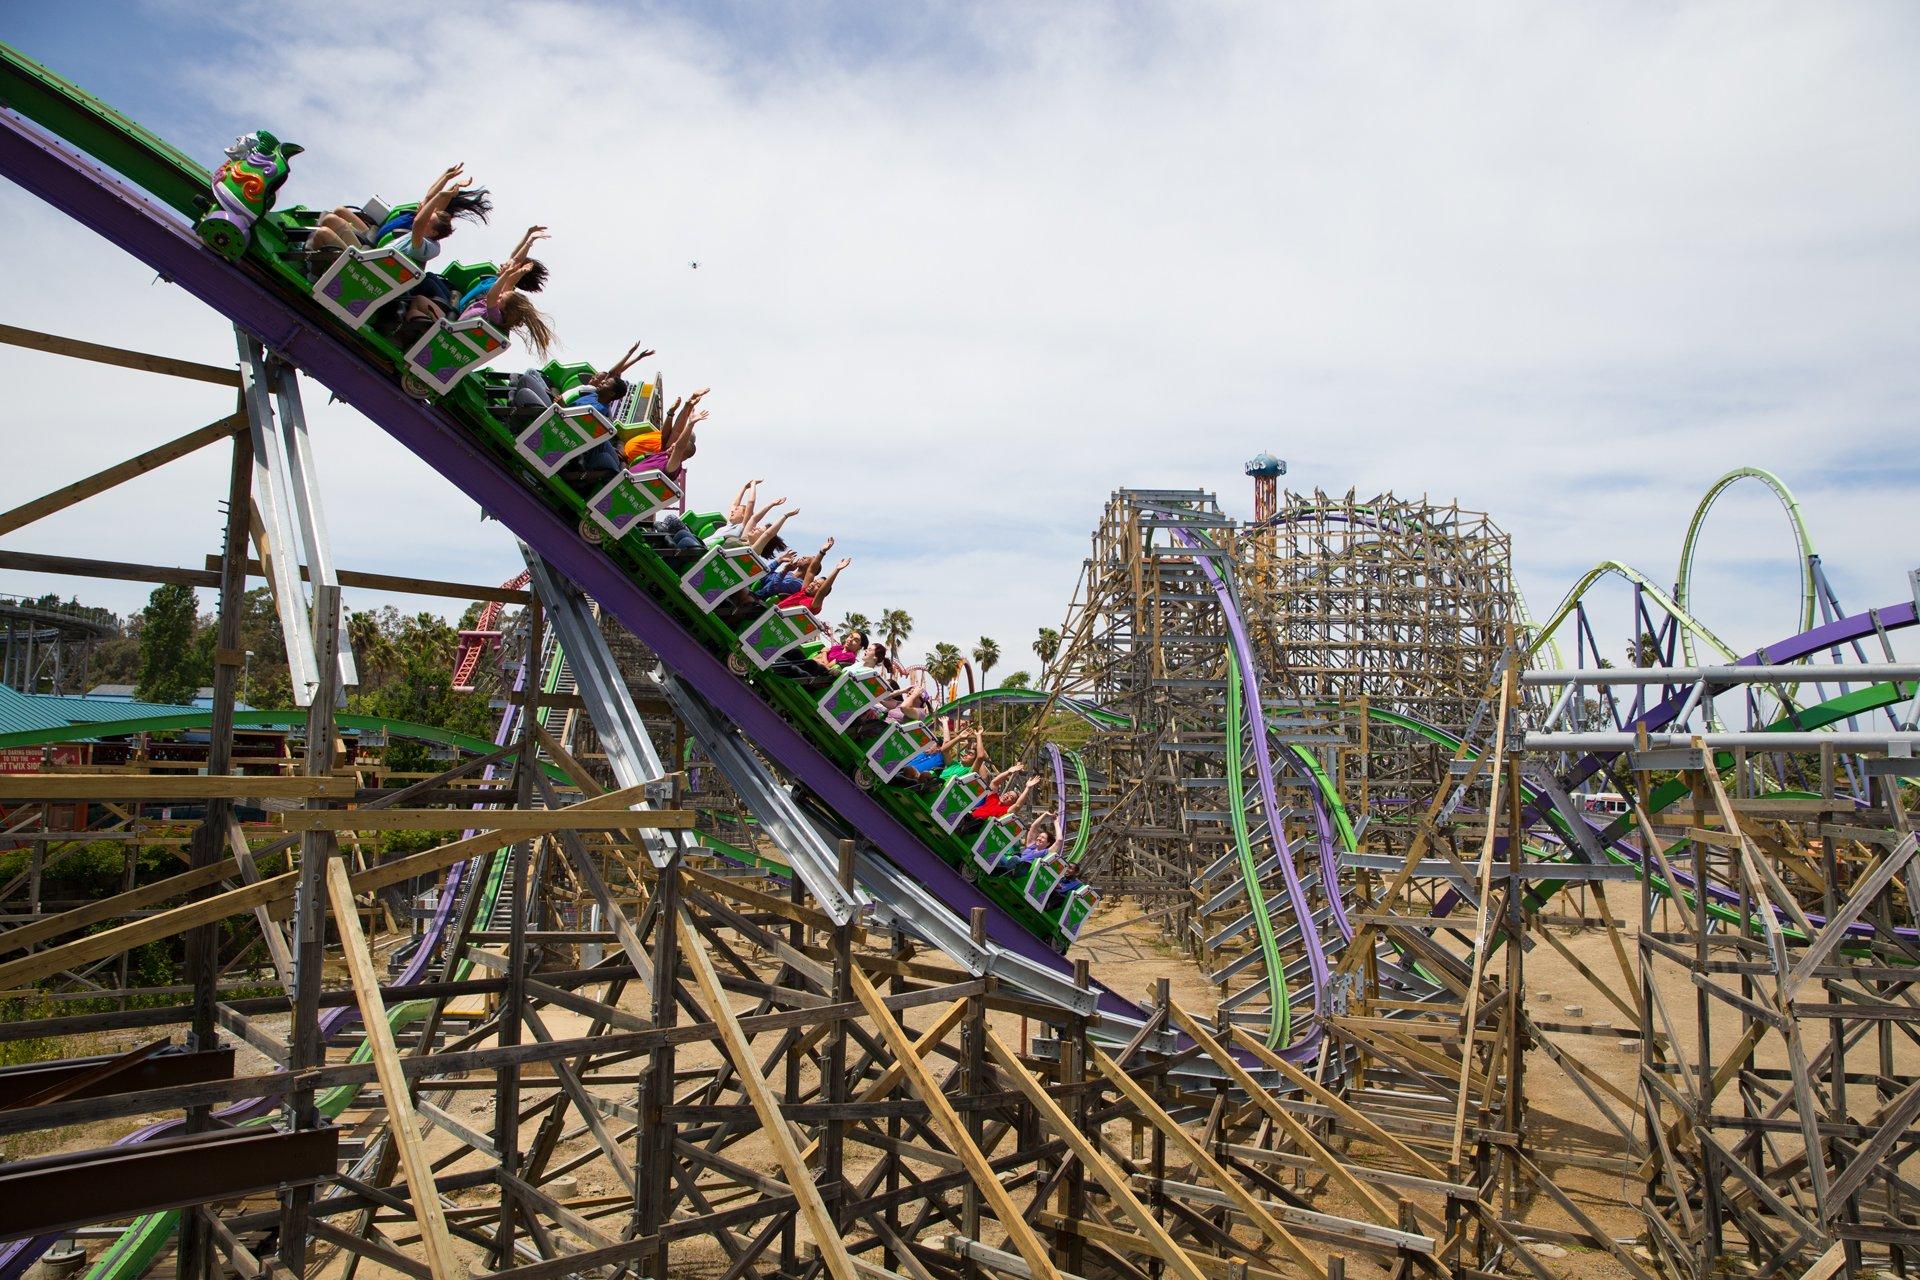 THE JOKER | Six Flags Discovery Kingdom